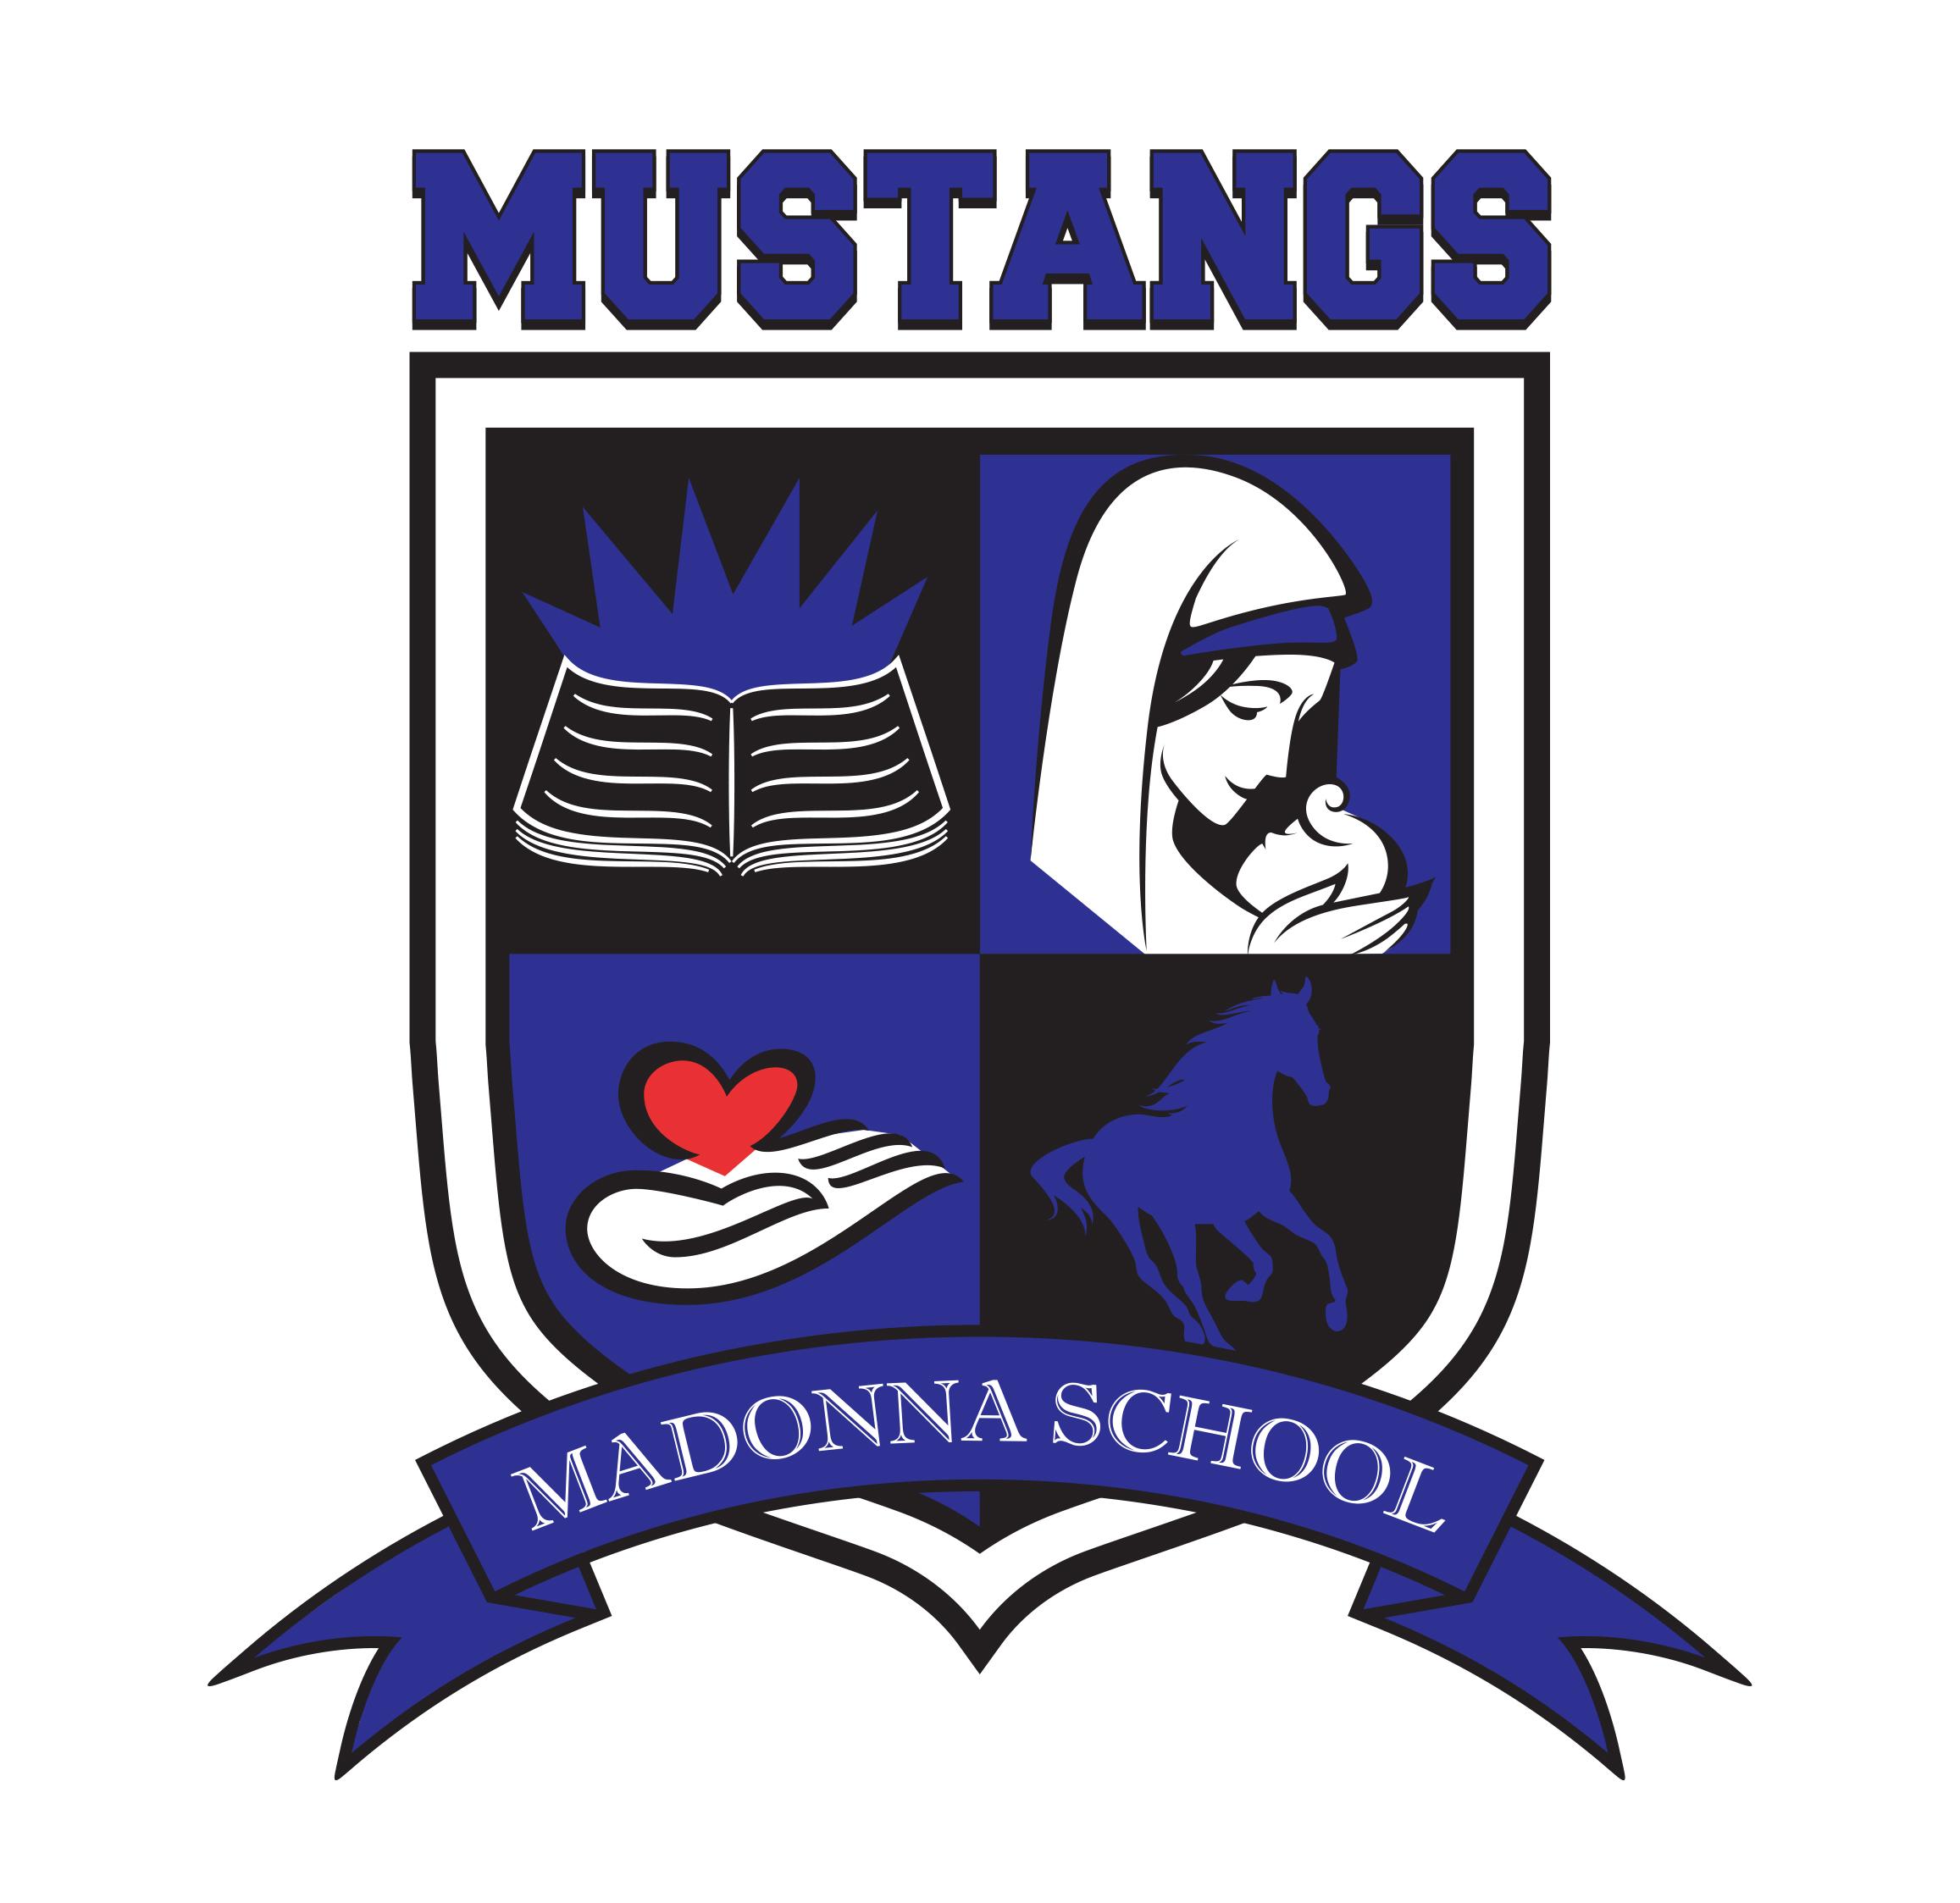 Mustangs Crest.jpg